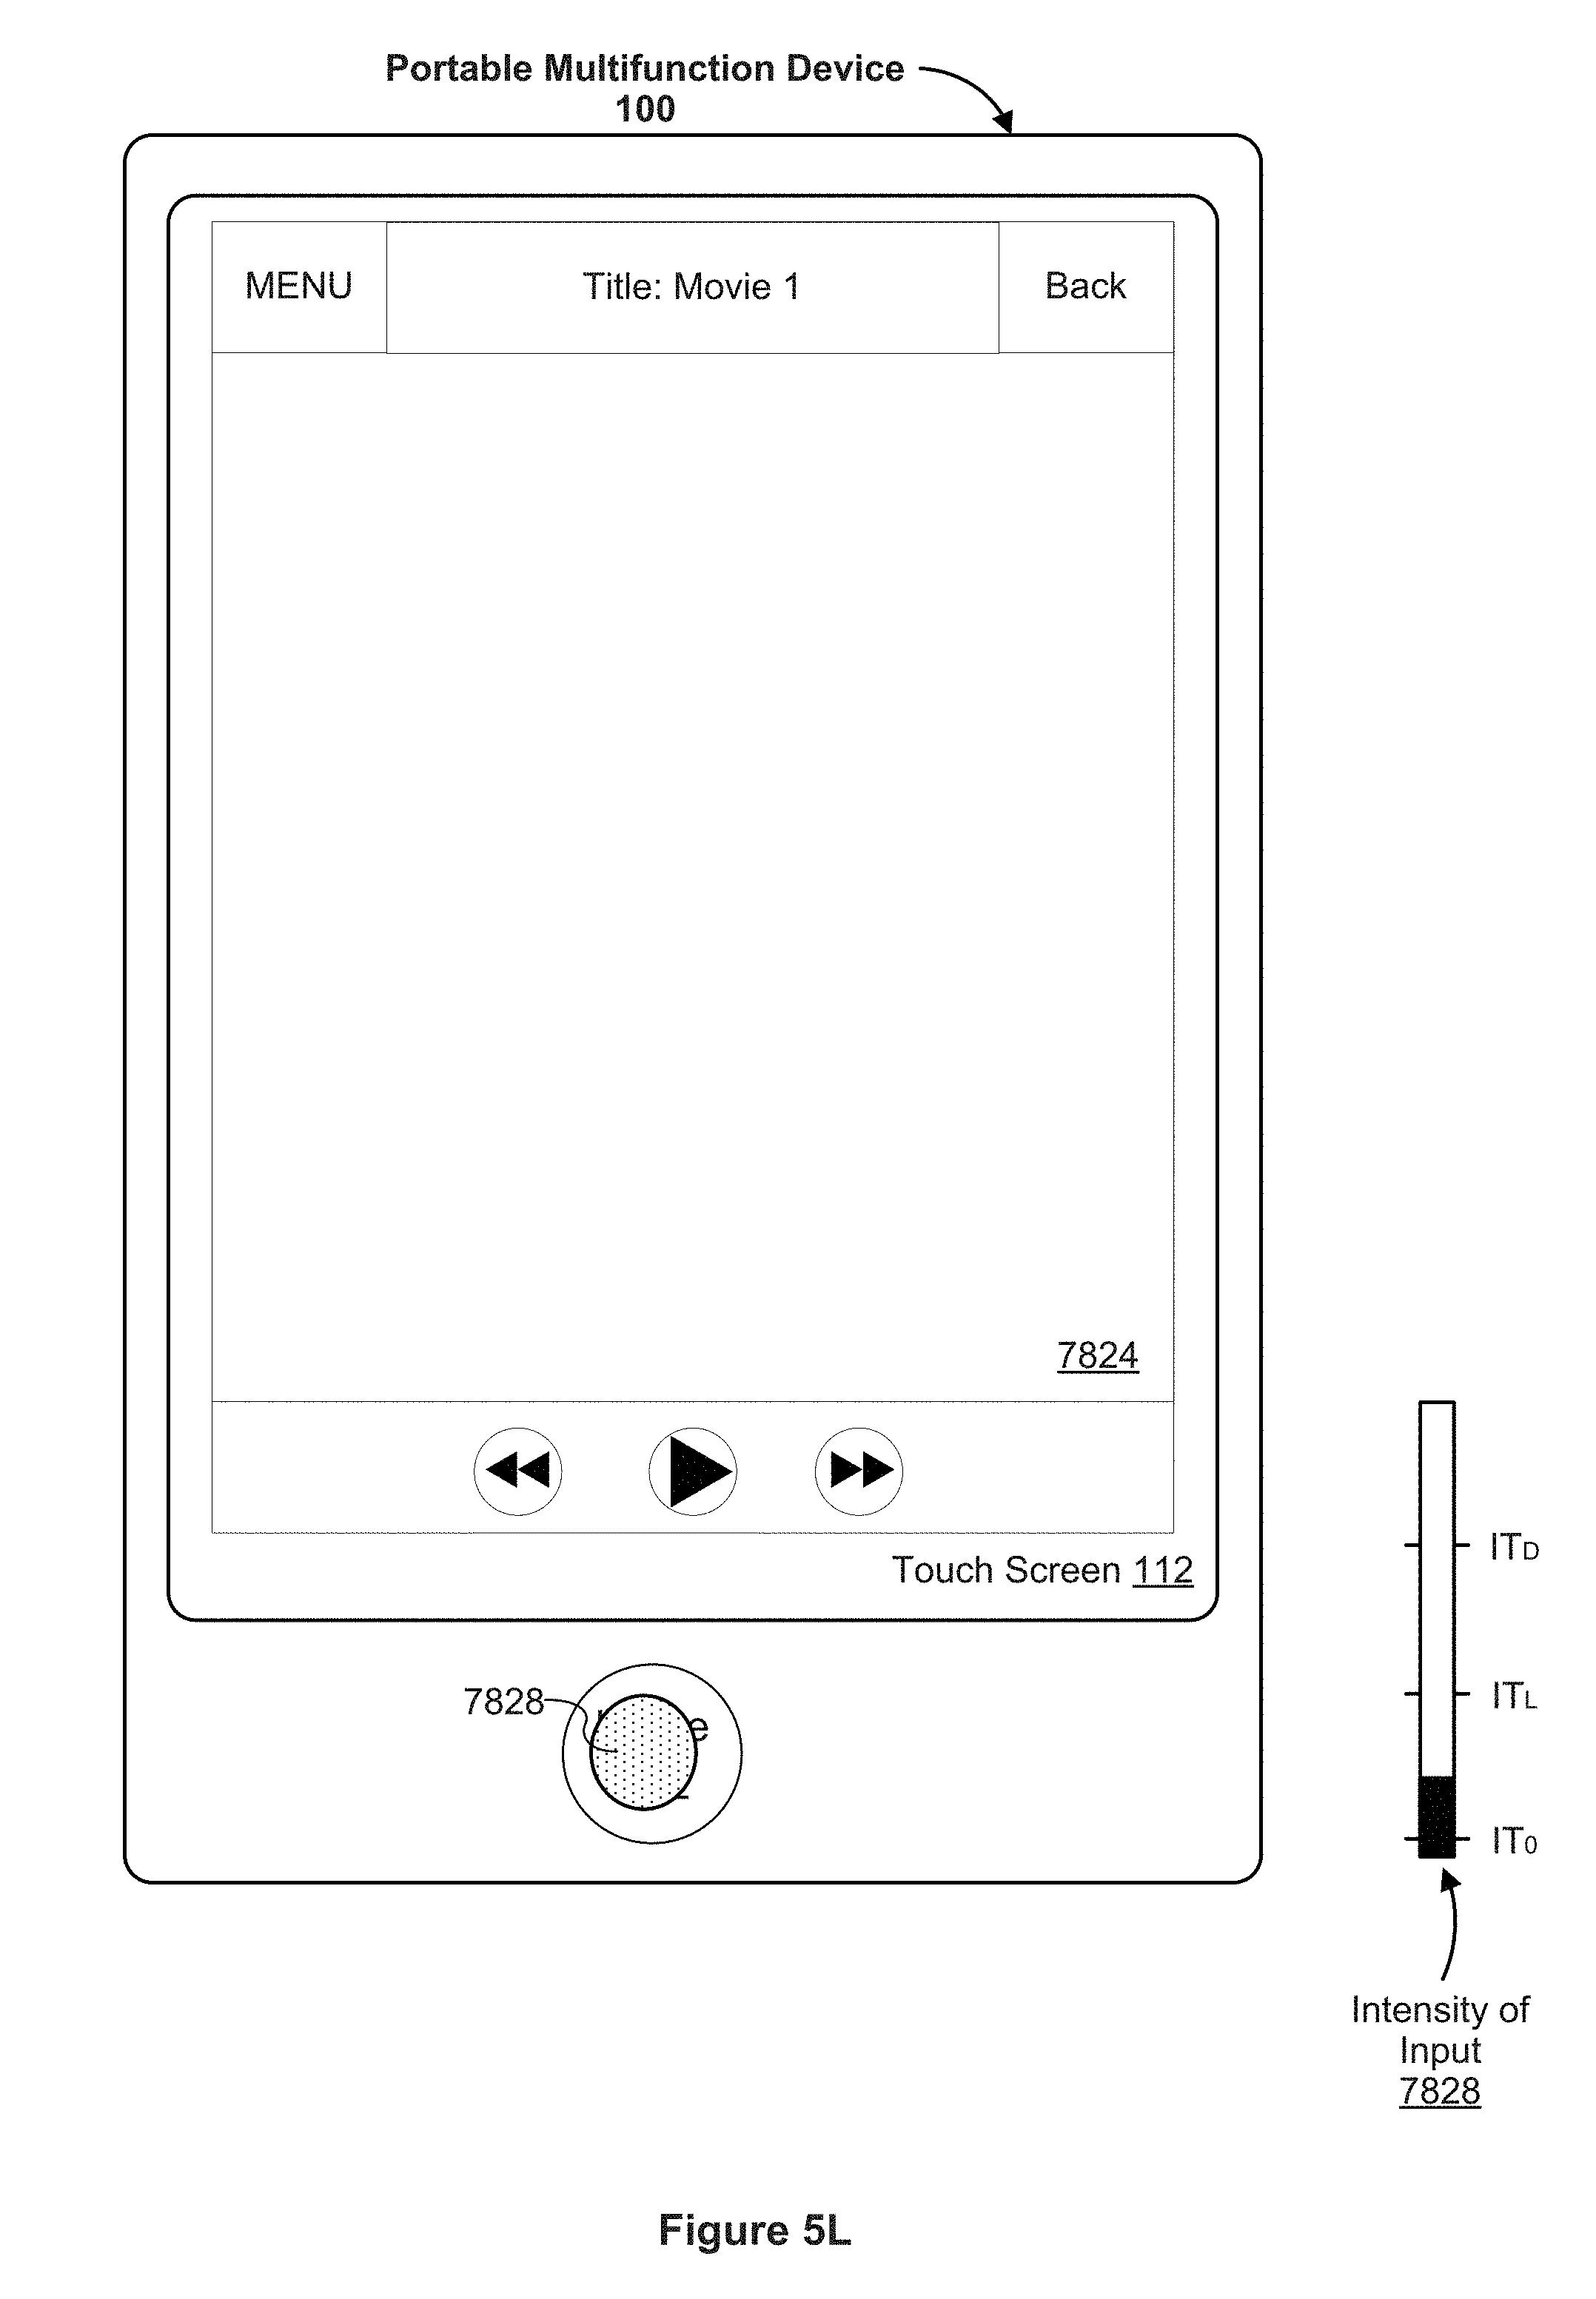 Patent US 9,959,025 B2